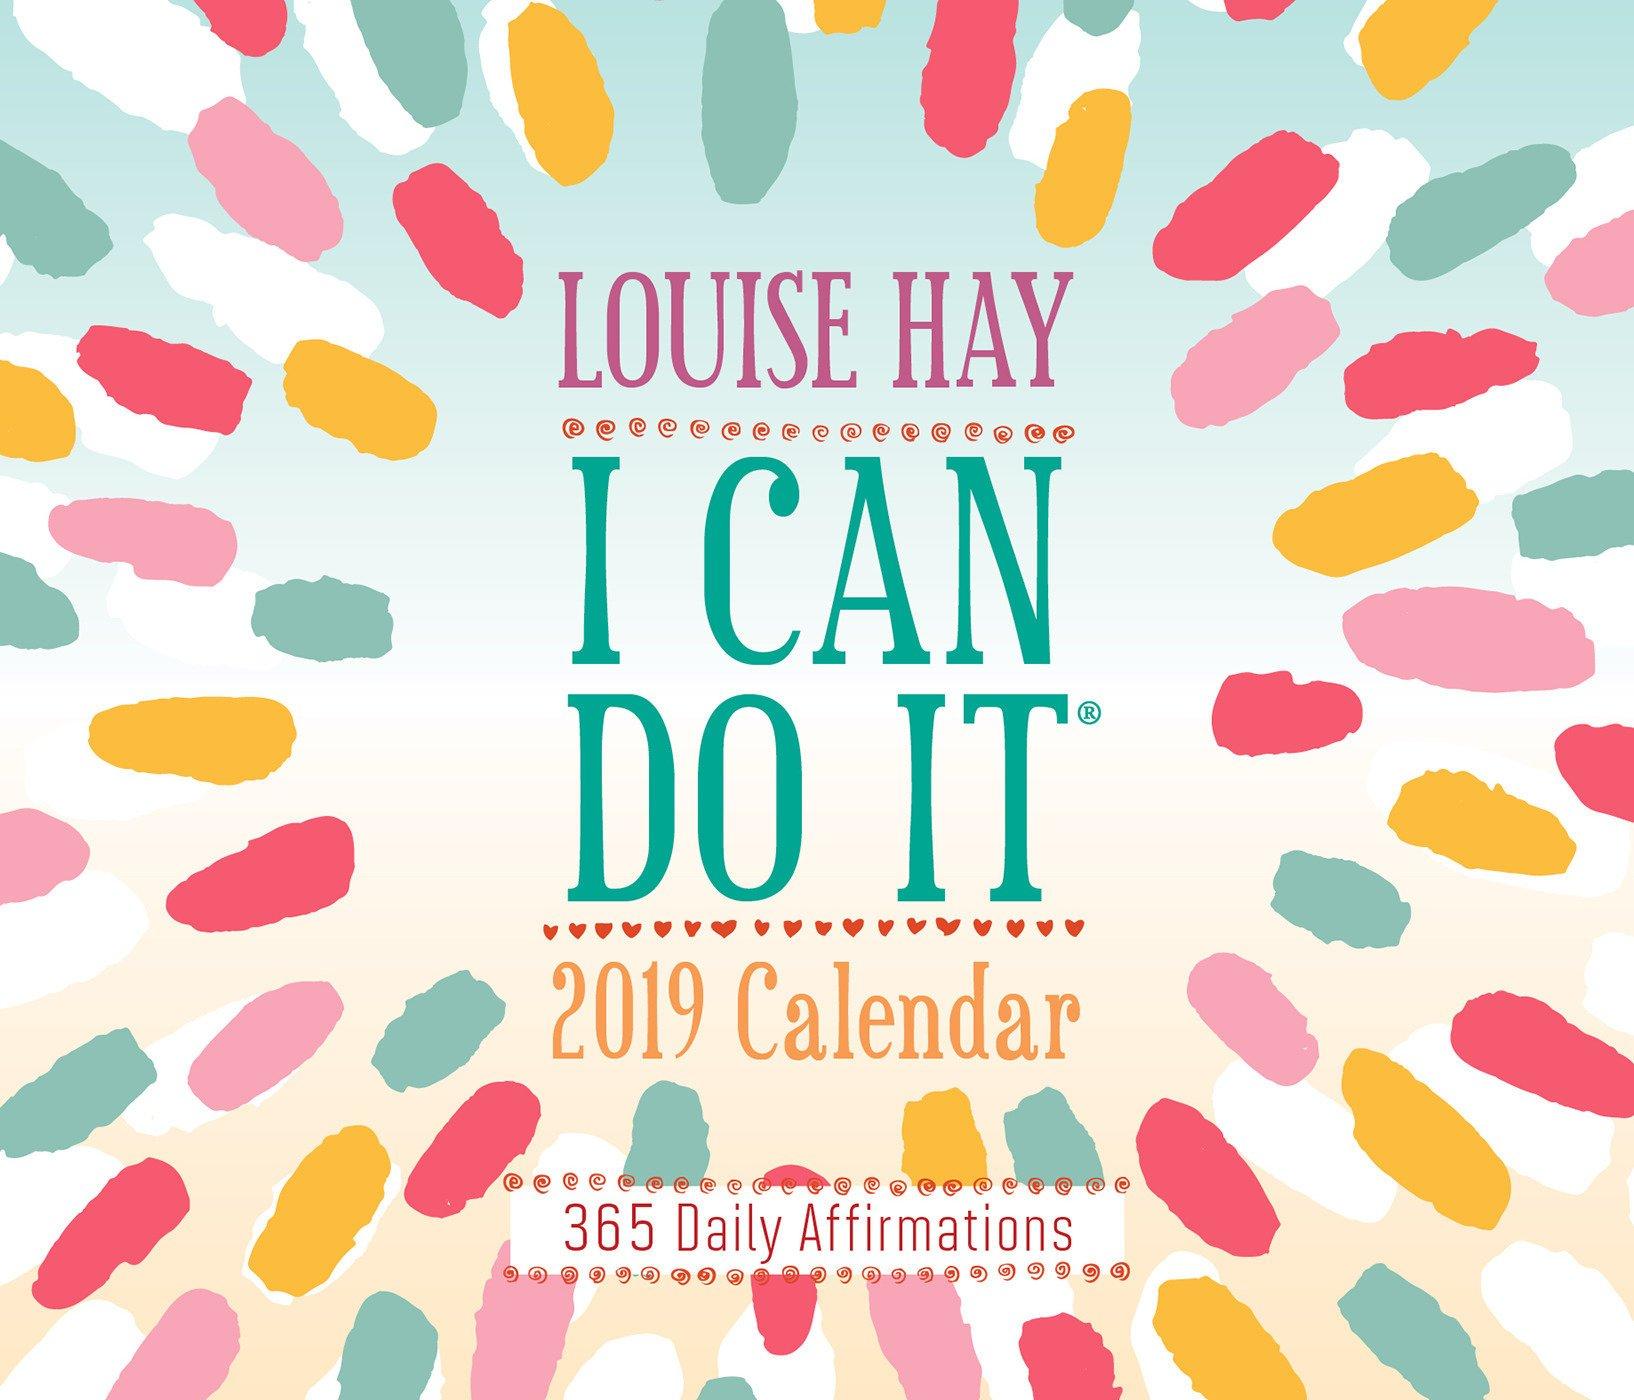 I Can Do It 2019 Calendar: 365 Daily Affirmations pdf